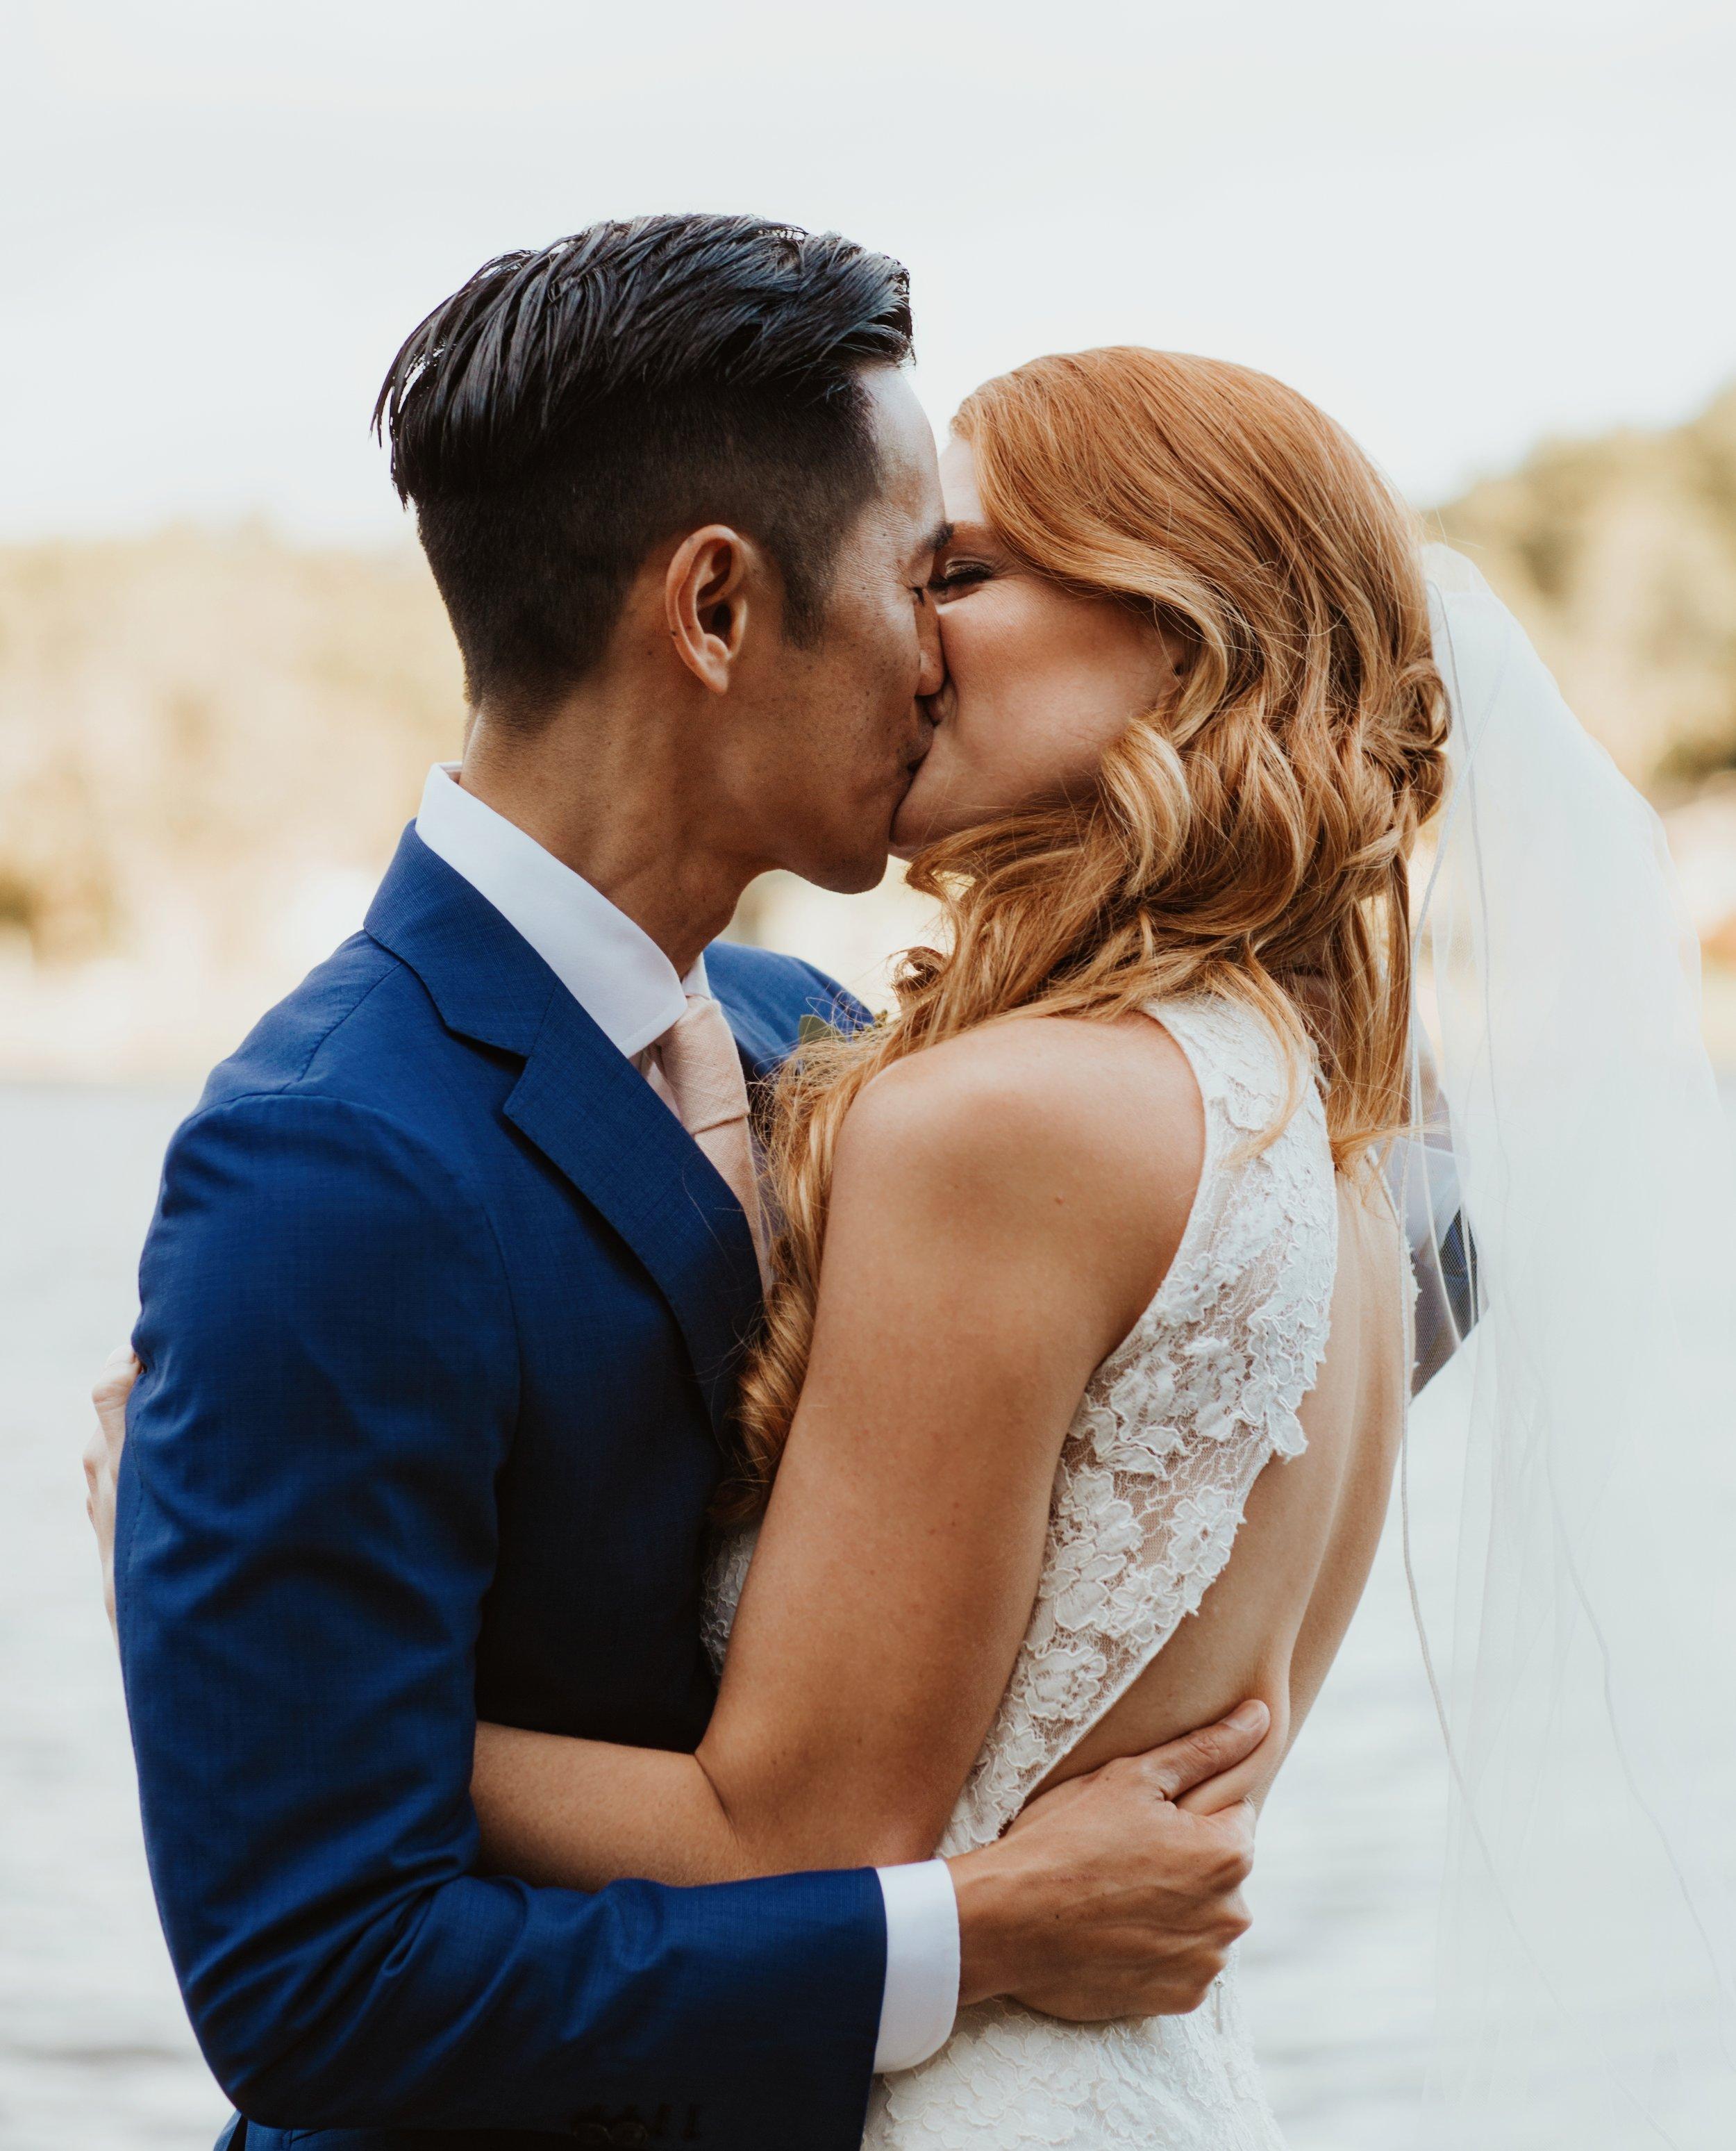 Wedding Day | Vanessa Boy | vanessaboy.com-847.com .jpg